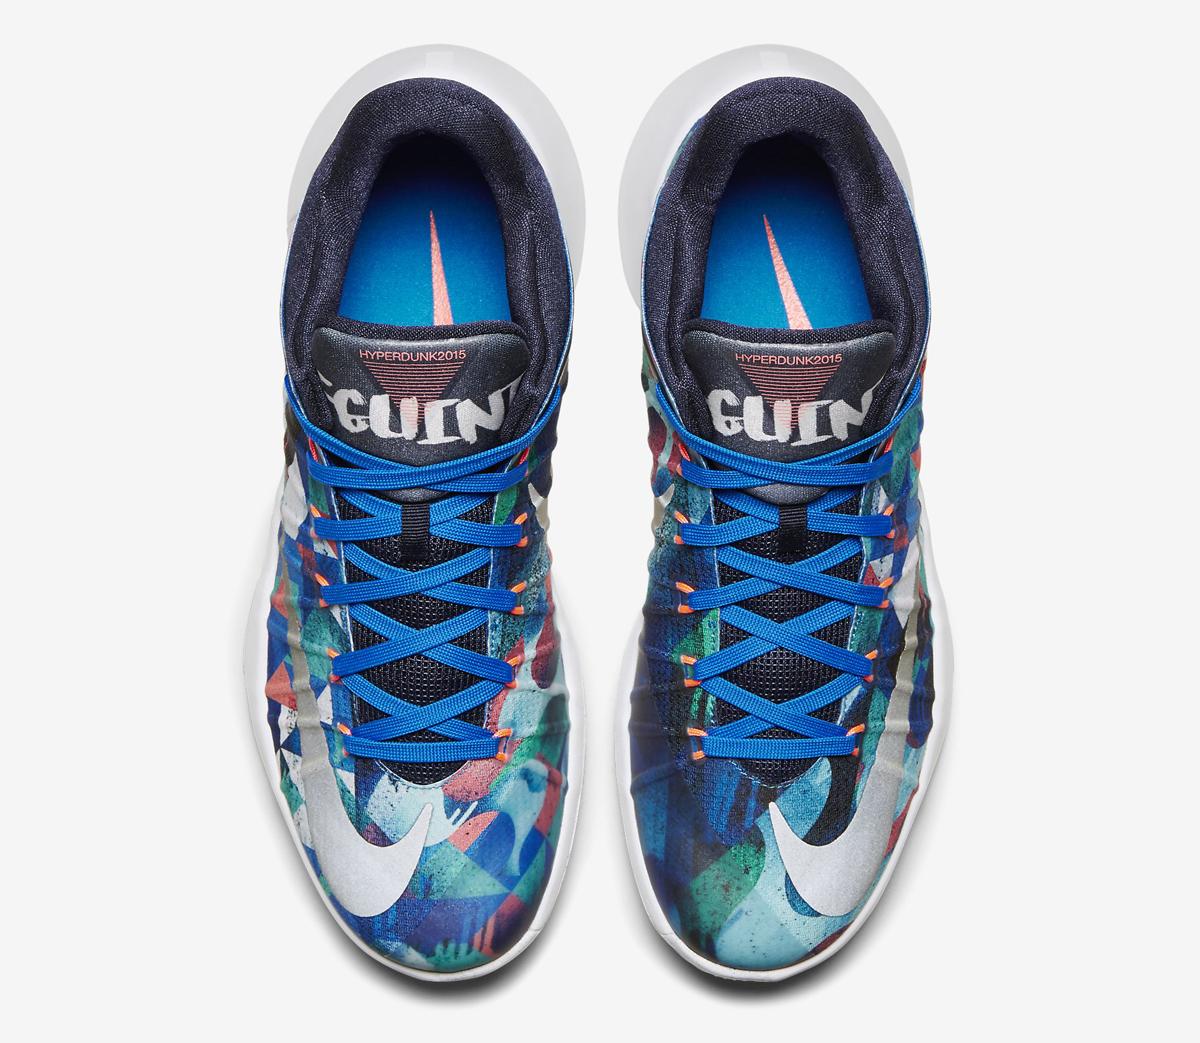 new styles dbc72 f85a3 Nike Hyperdunk 2015 Low